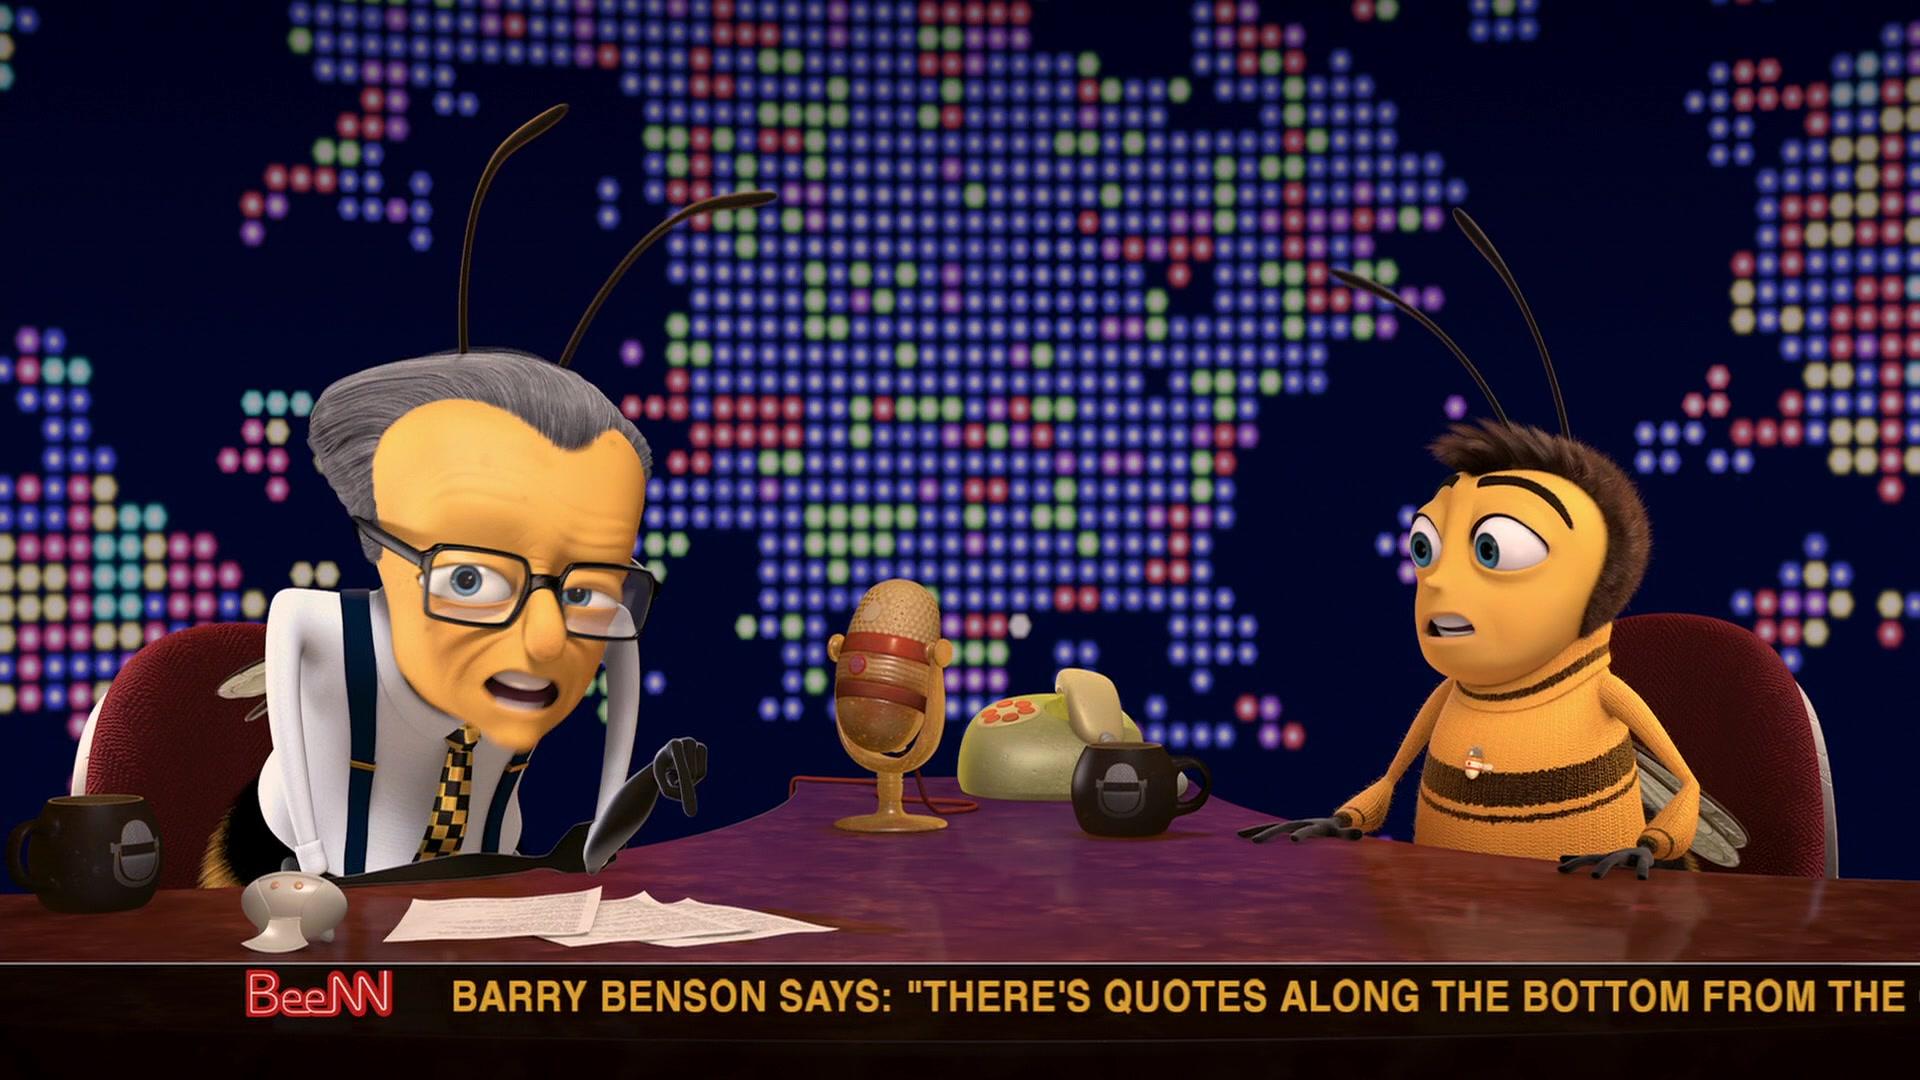 Beenn Cnn In Bee Movie 2007